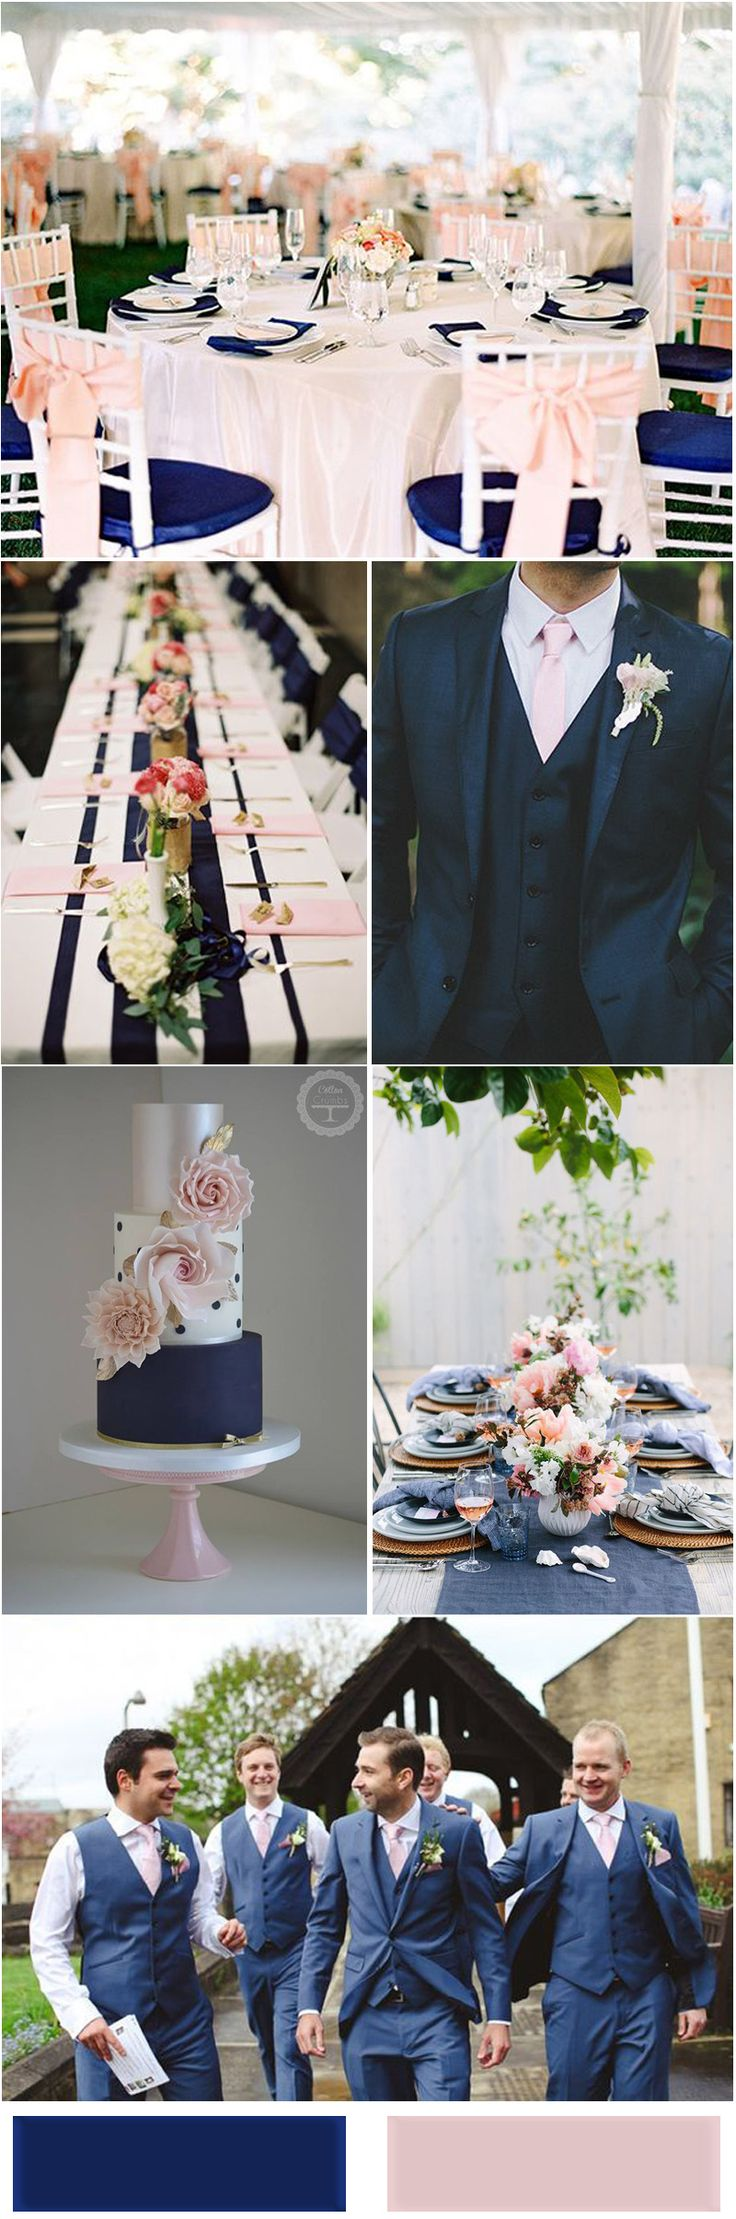 Best 25 Navy blush weddings ideas on Pinterest  Blush